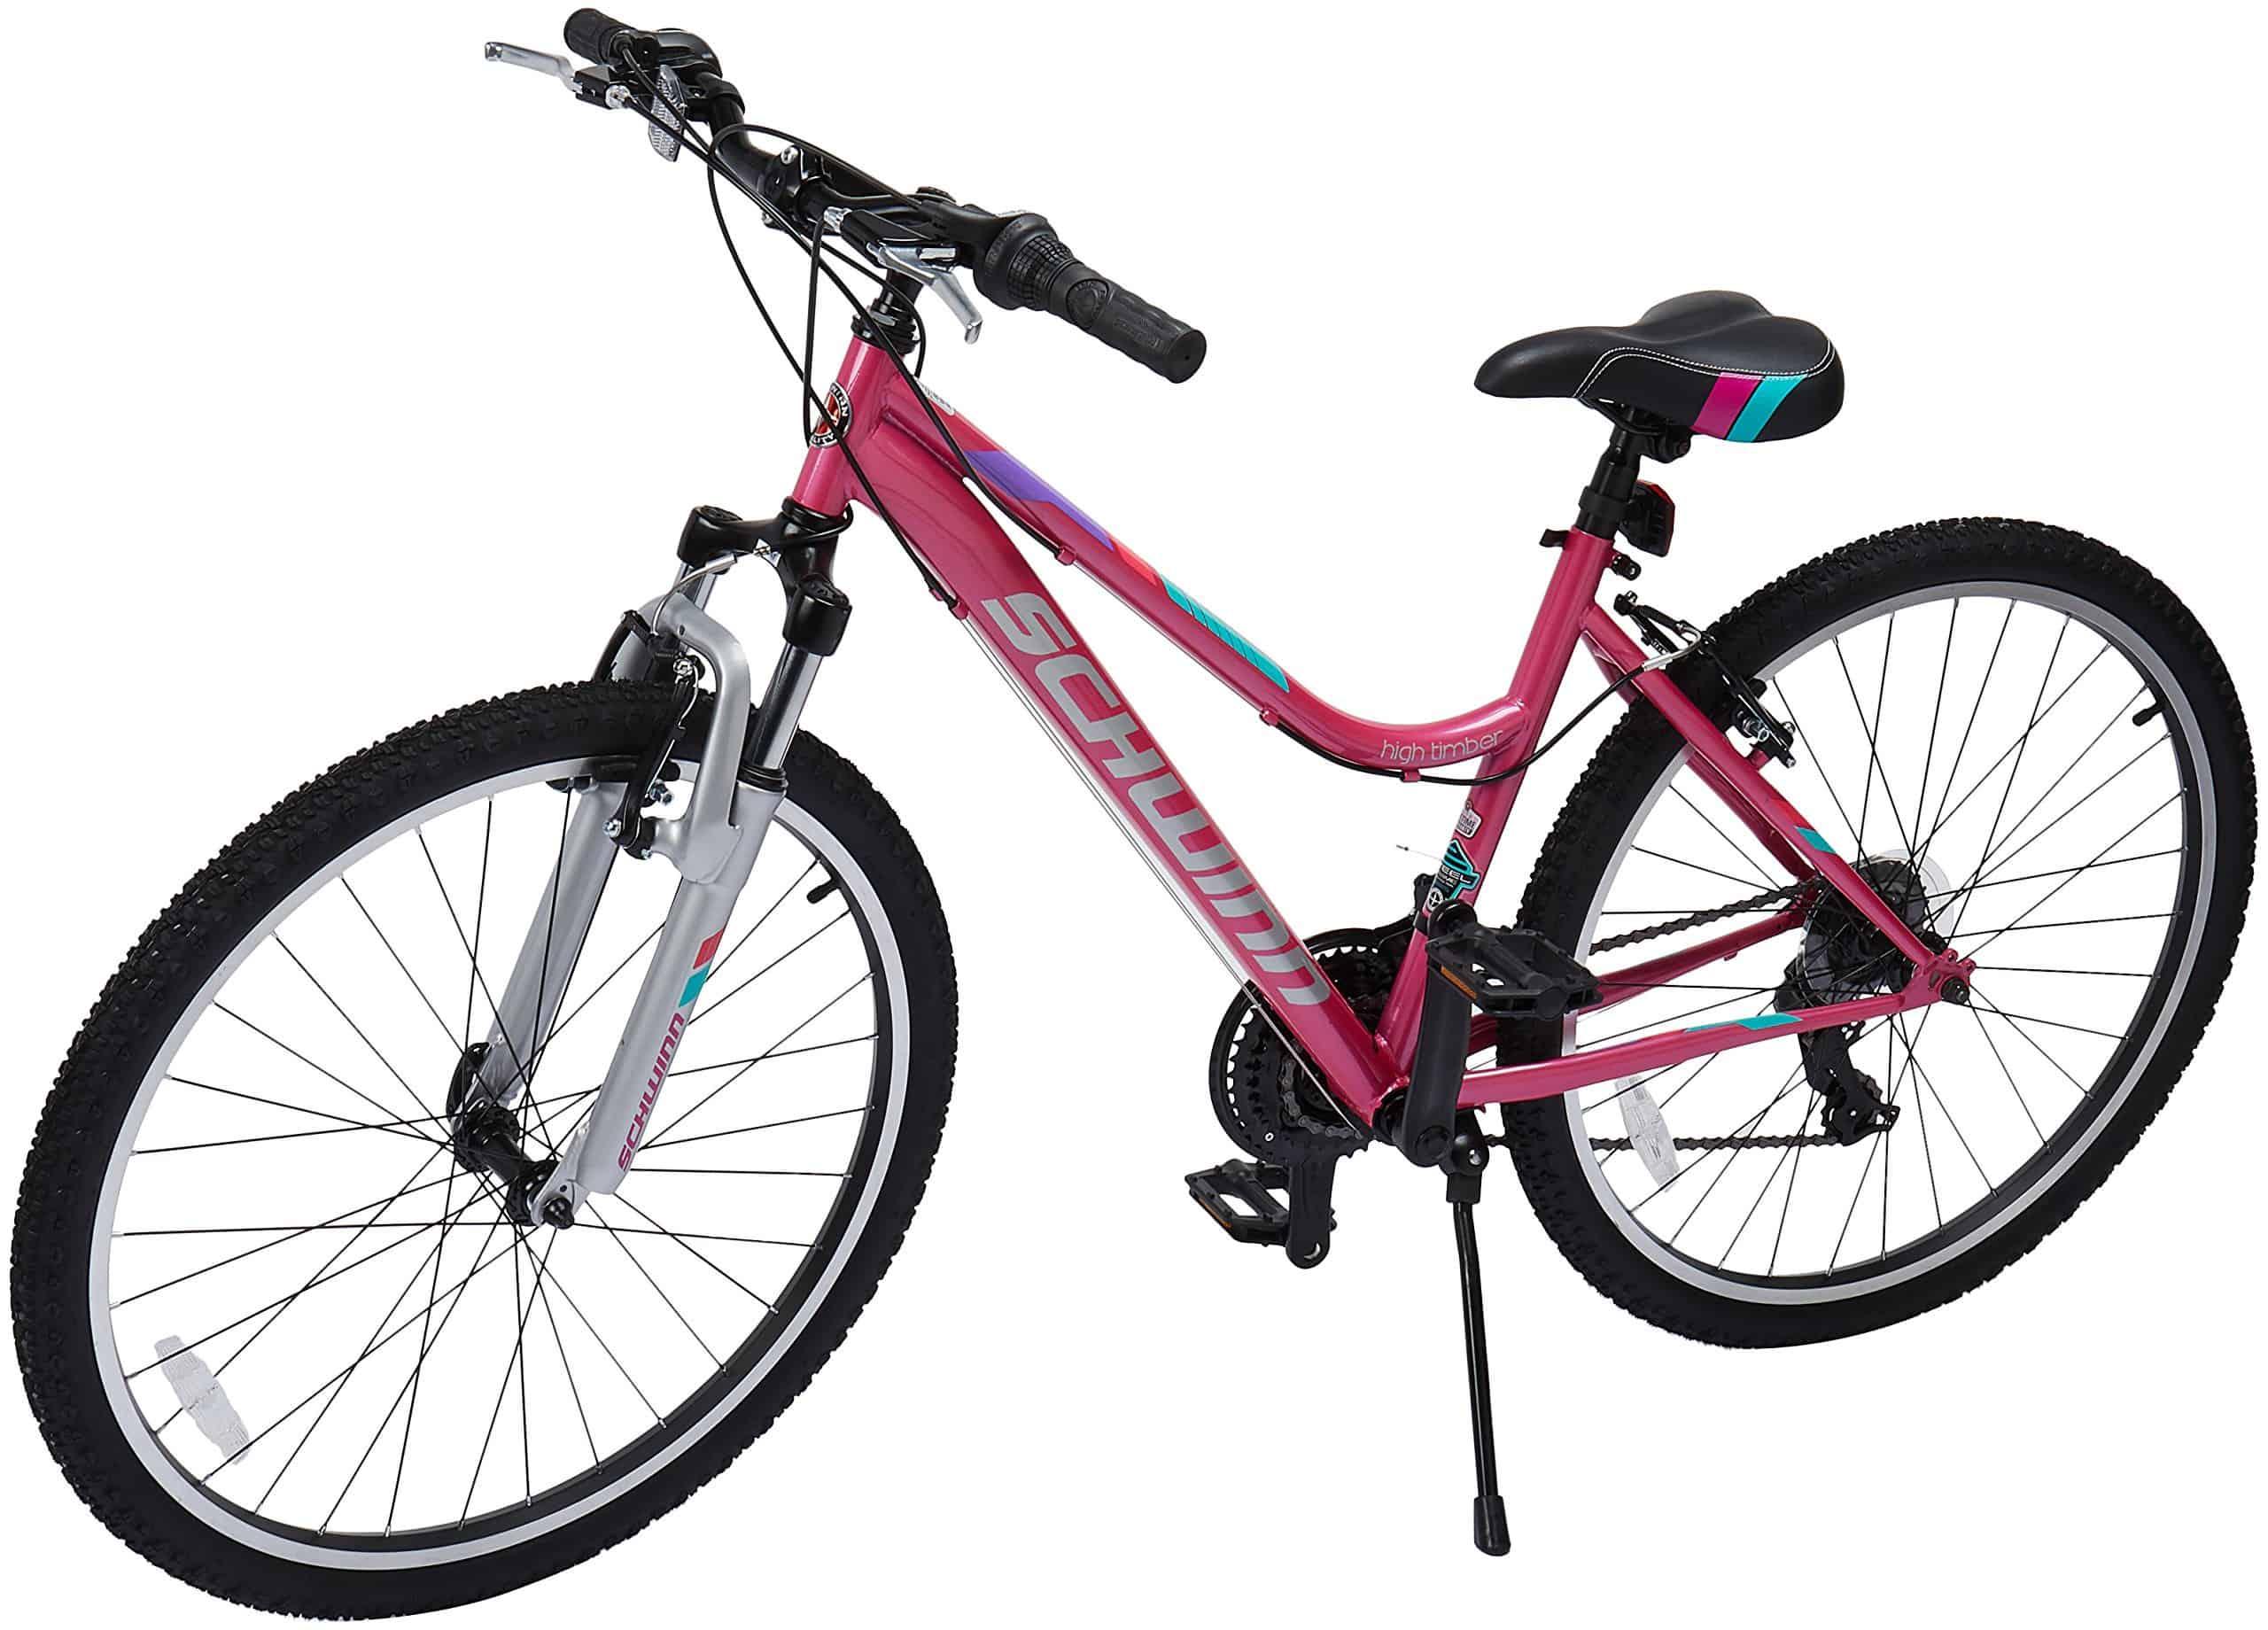 Schwinn High Timber Women's Mountain Bike 26 Wheels